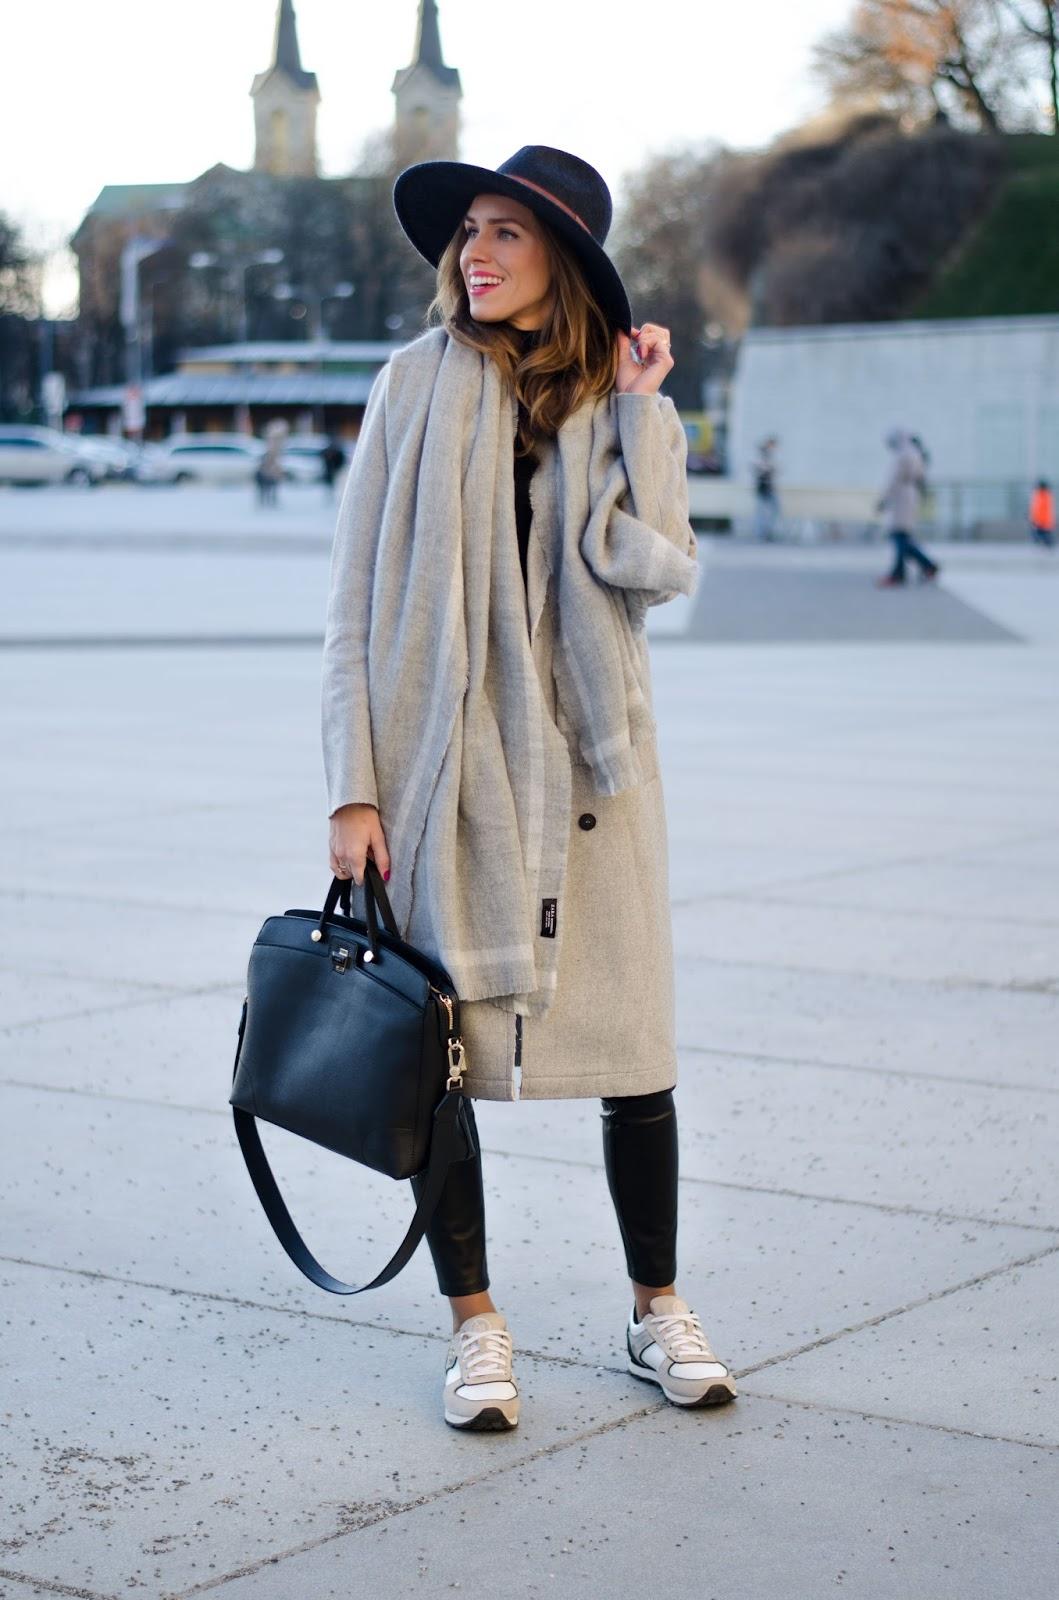 kristjaana mere gray wool coat long scarf fedora minimal winter outfit